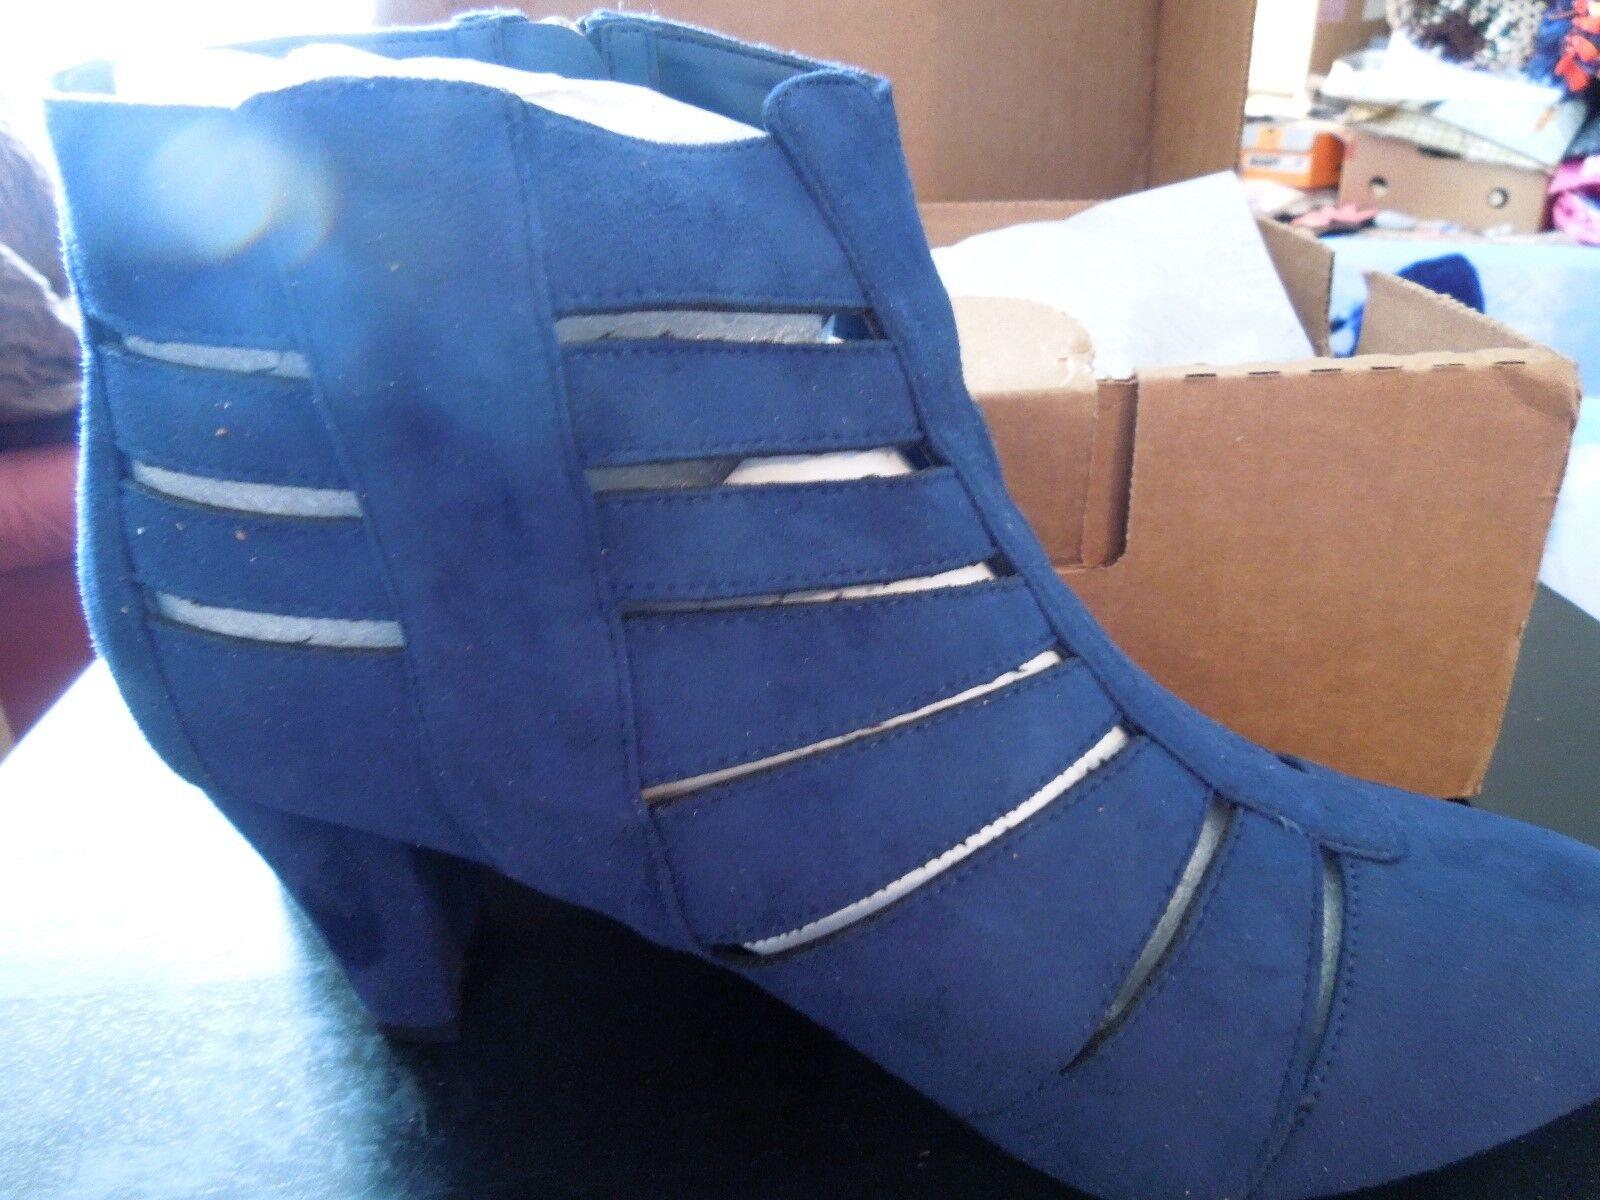 NIB - Comfortview - 12W - Dark Denim bluee bluee bluee - Sloane Bootie - Suede 33f928